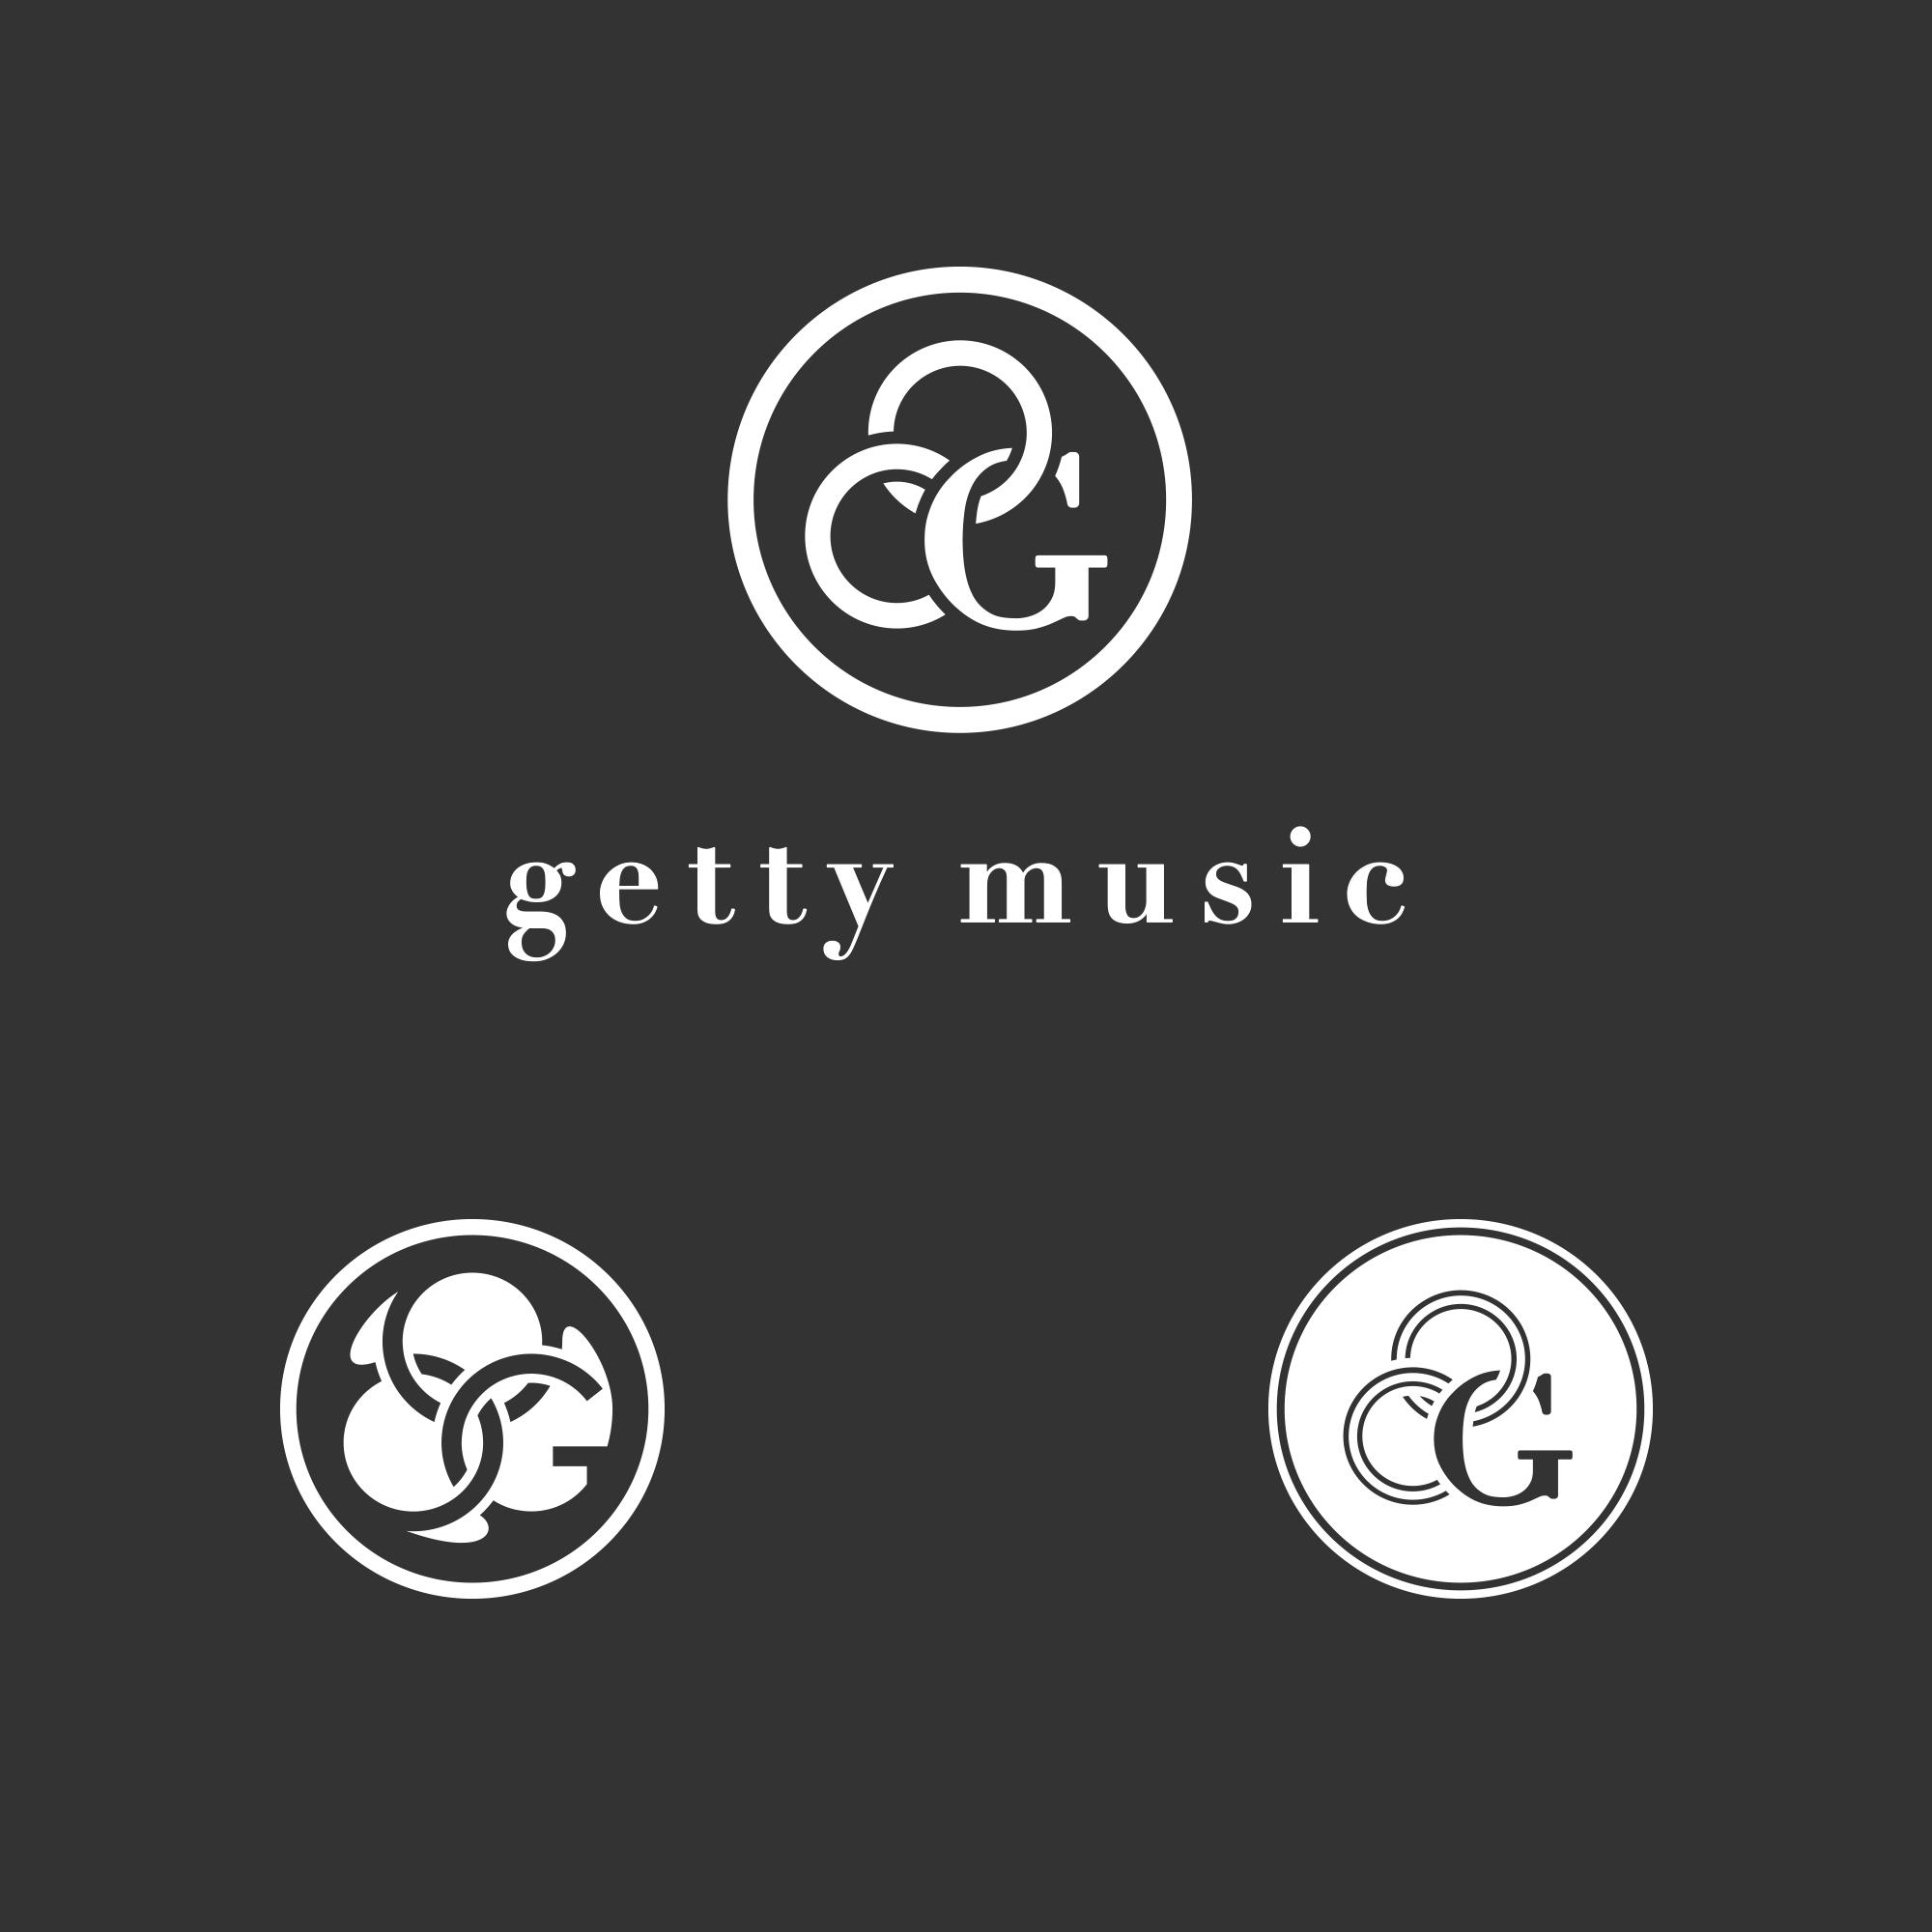 ajr-logos-010-gettymusic